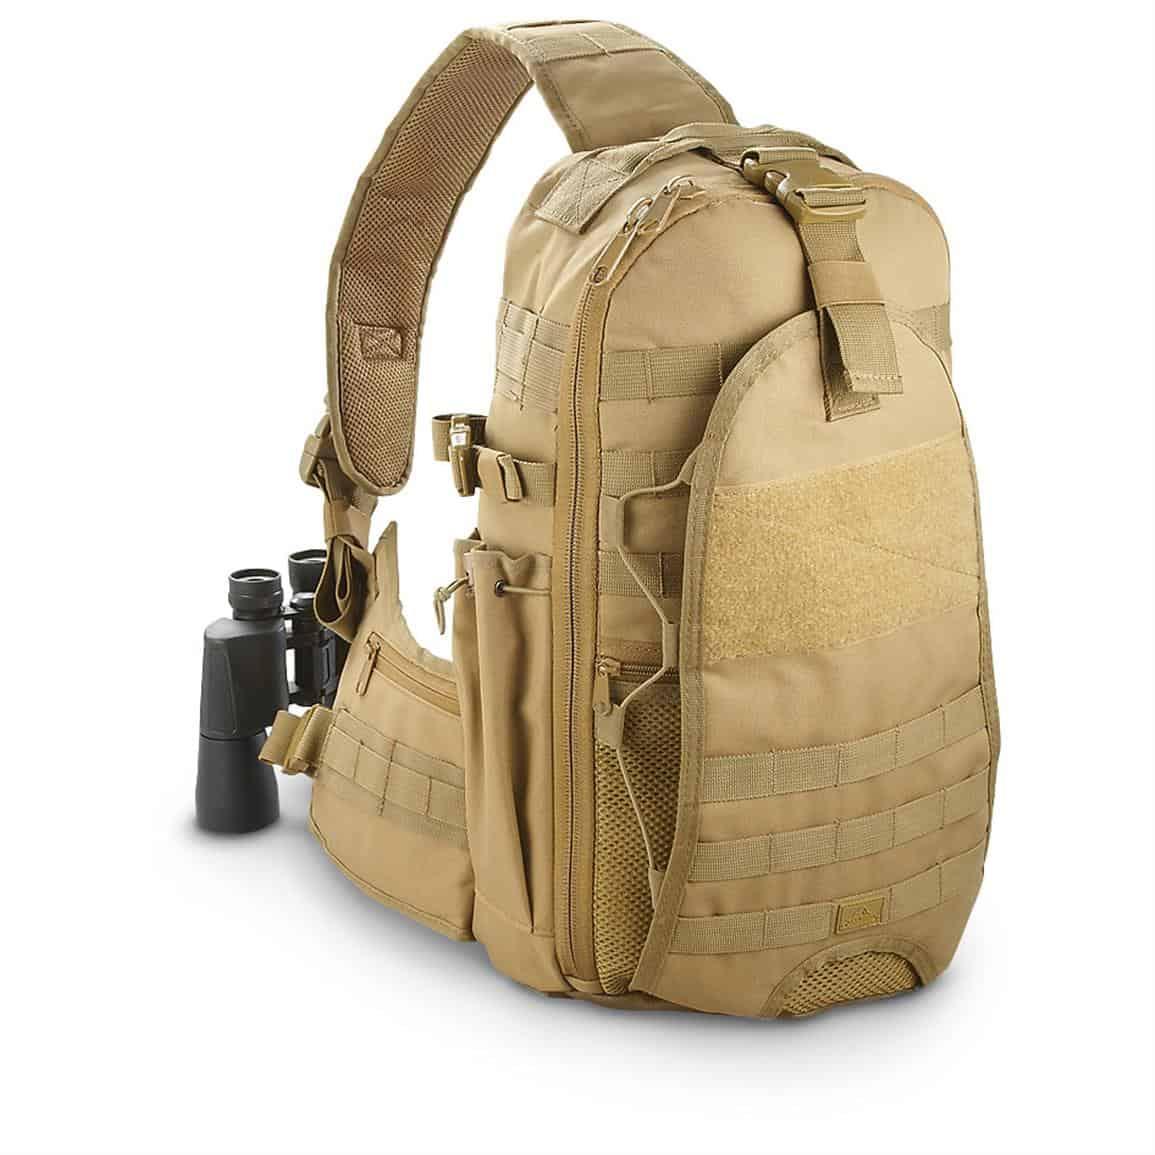 Red Rock Outdoor Sling Bag